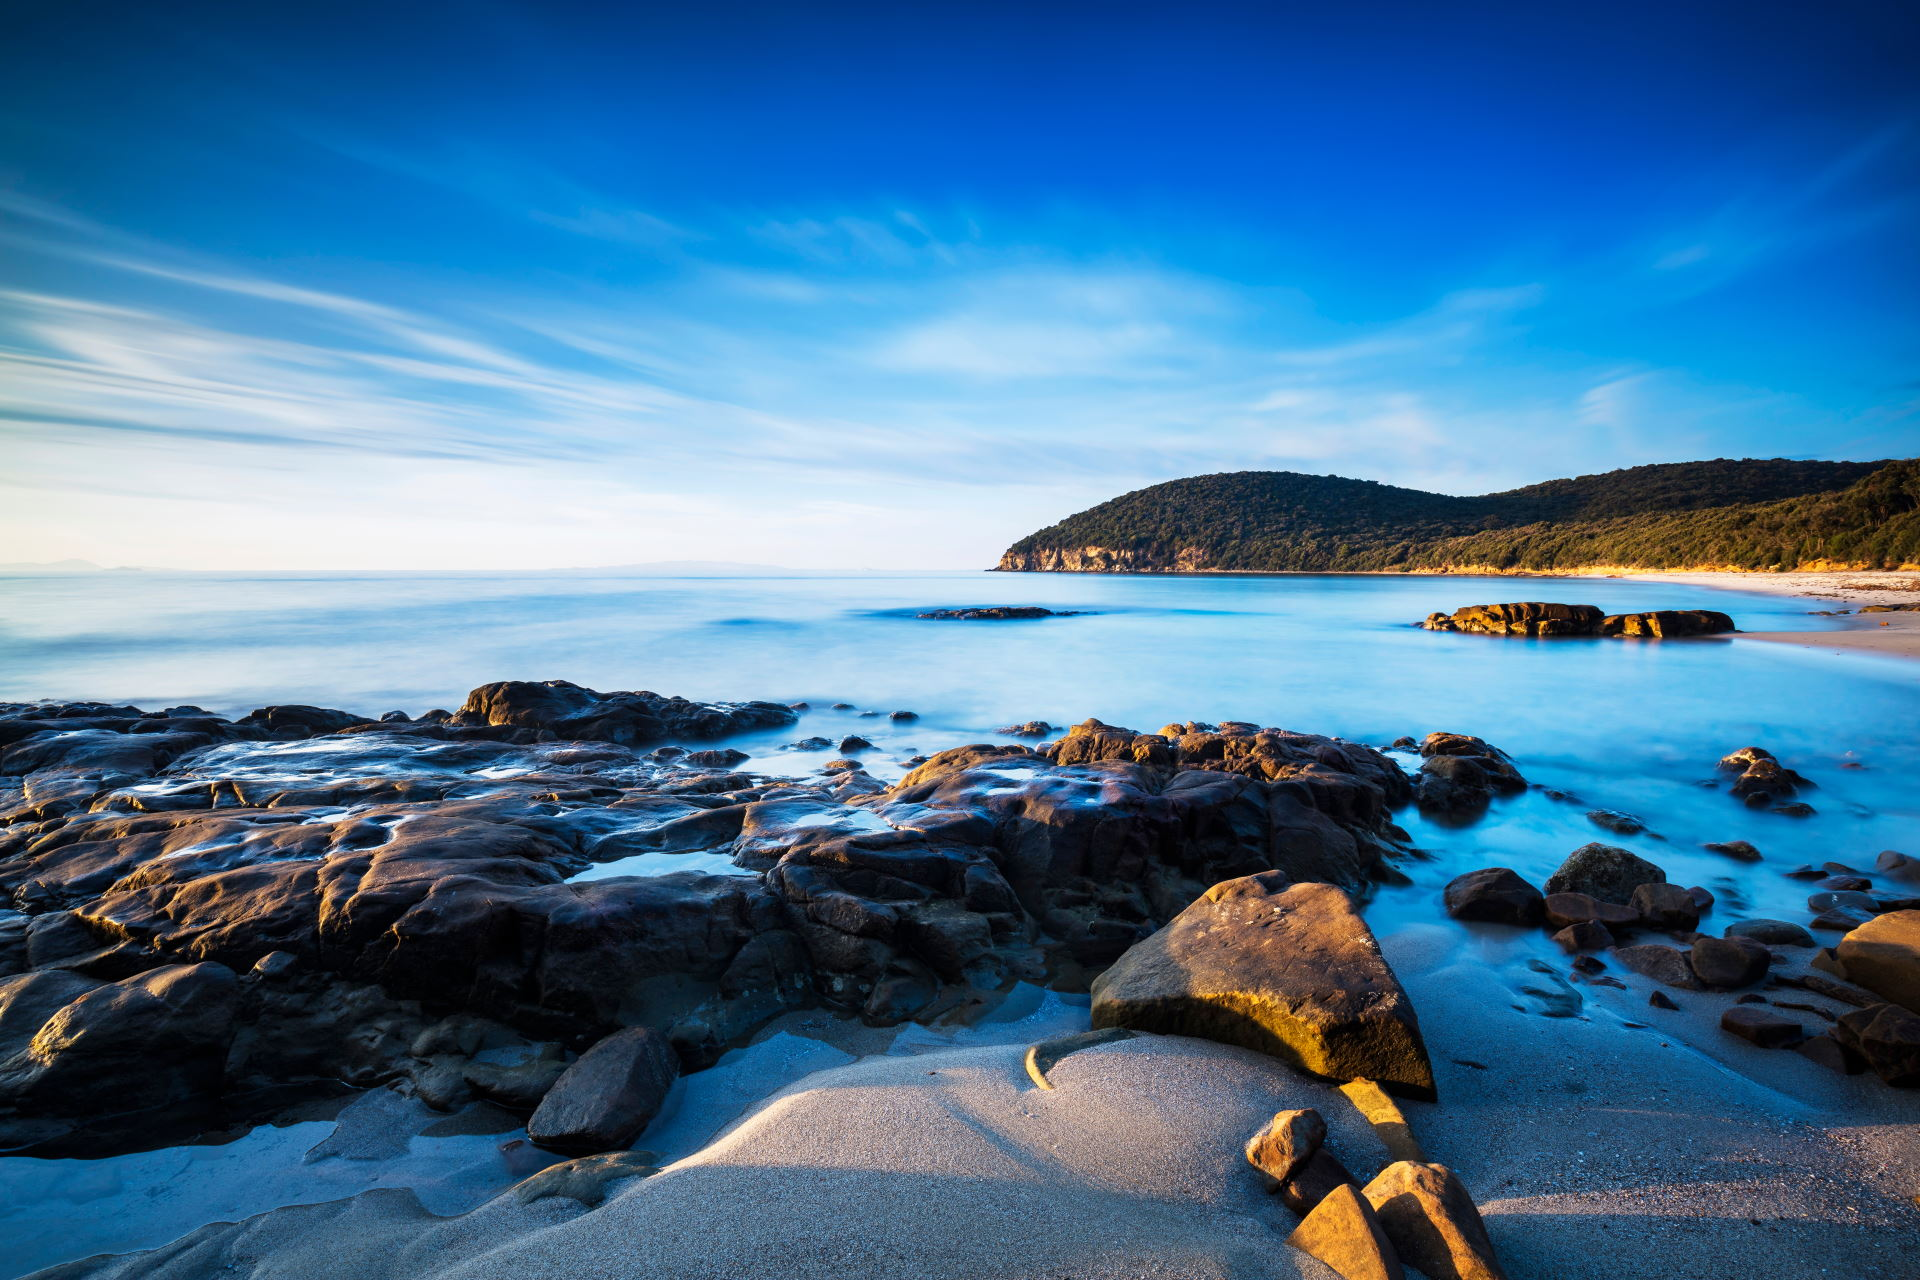 Sunset Cala Violina bay beach in Maremma, Tuscany. Travel destination in Mediterranean sea. Italy, Europe. Long Exposure.